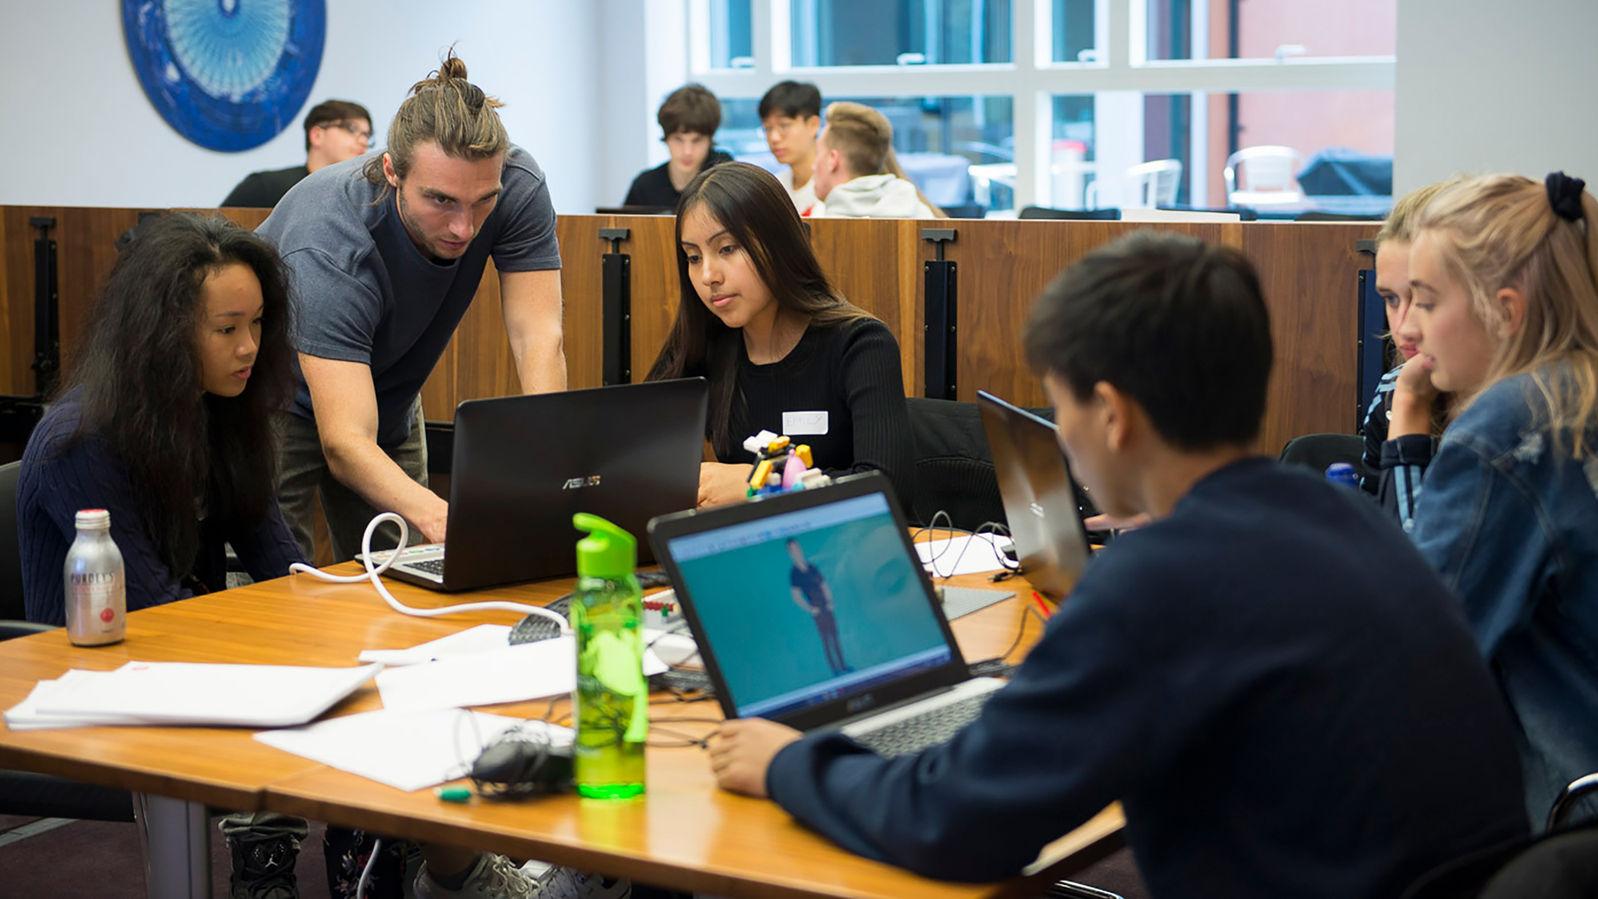 Freelance Learning Facilitators